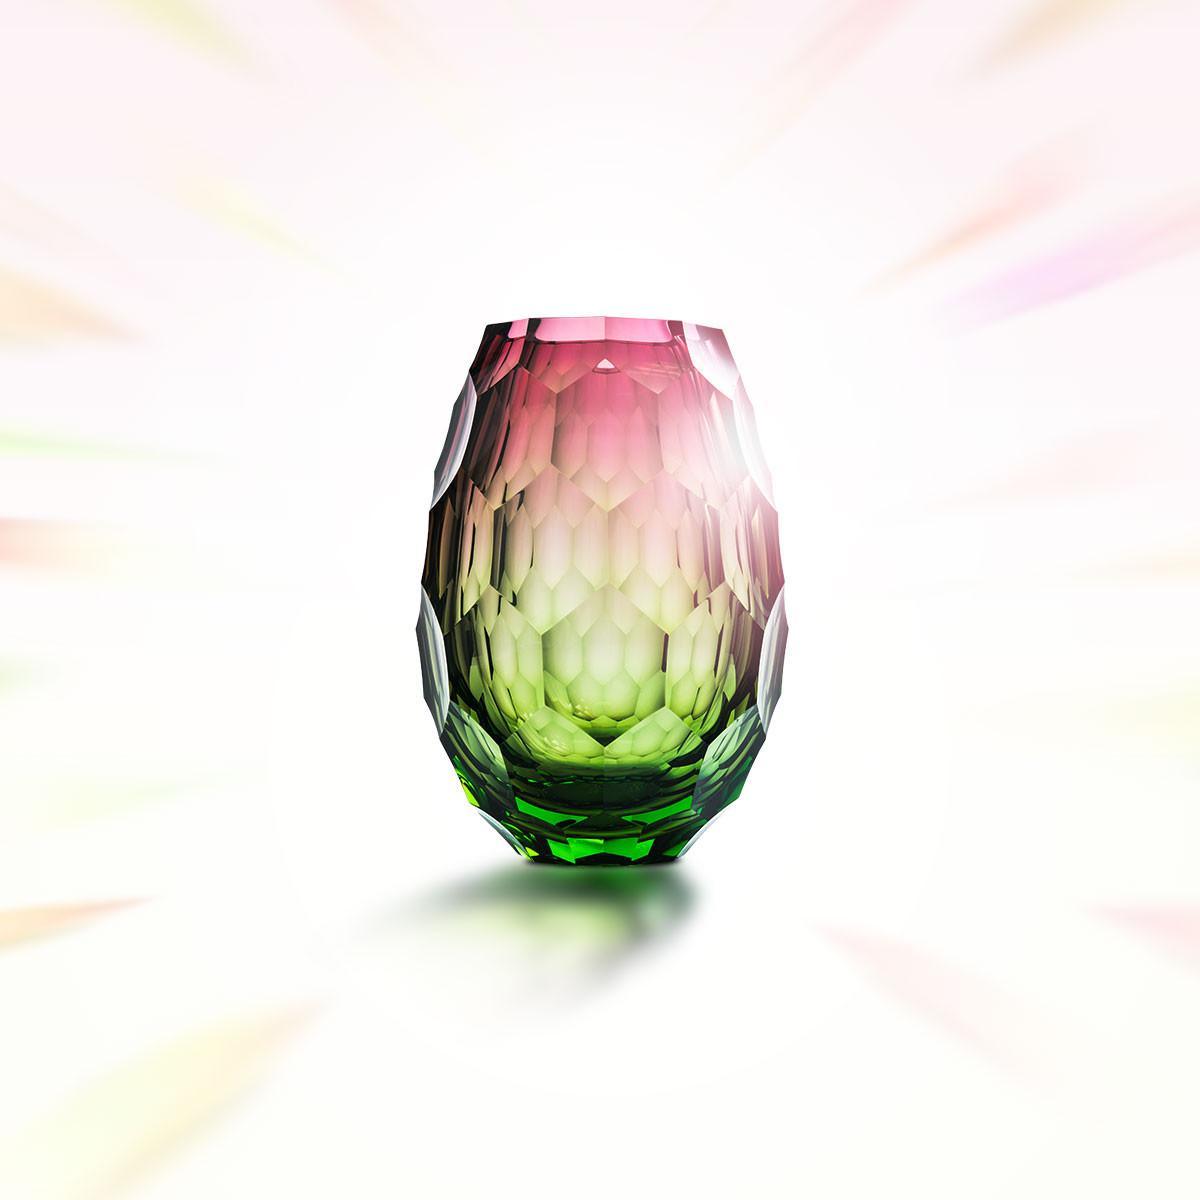 18 Popular Vision Glass Vases wholesale 2021 free download vision glass vases wholesale of welcome to the moser glassworks moser glass com for fb share